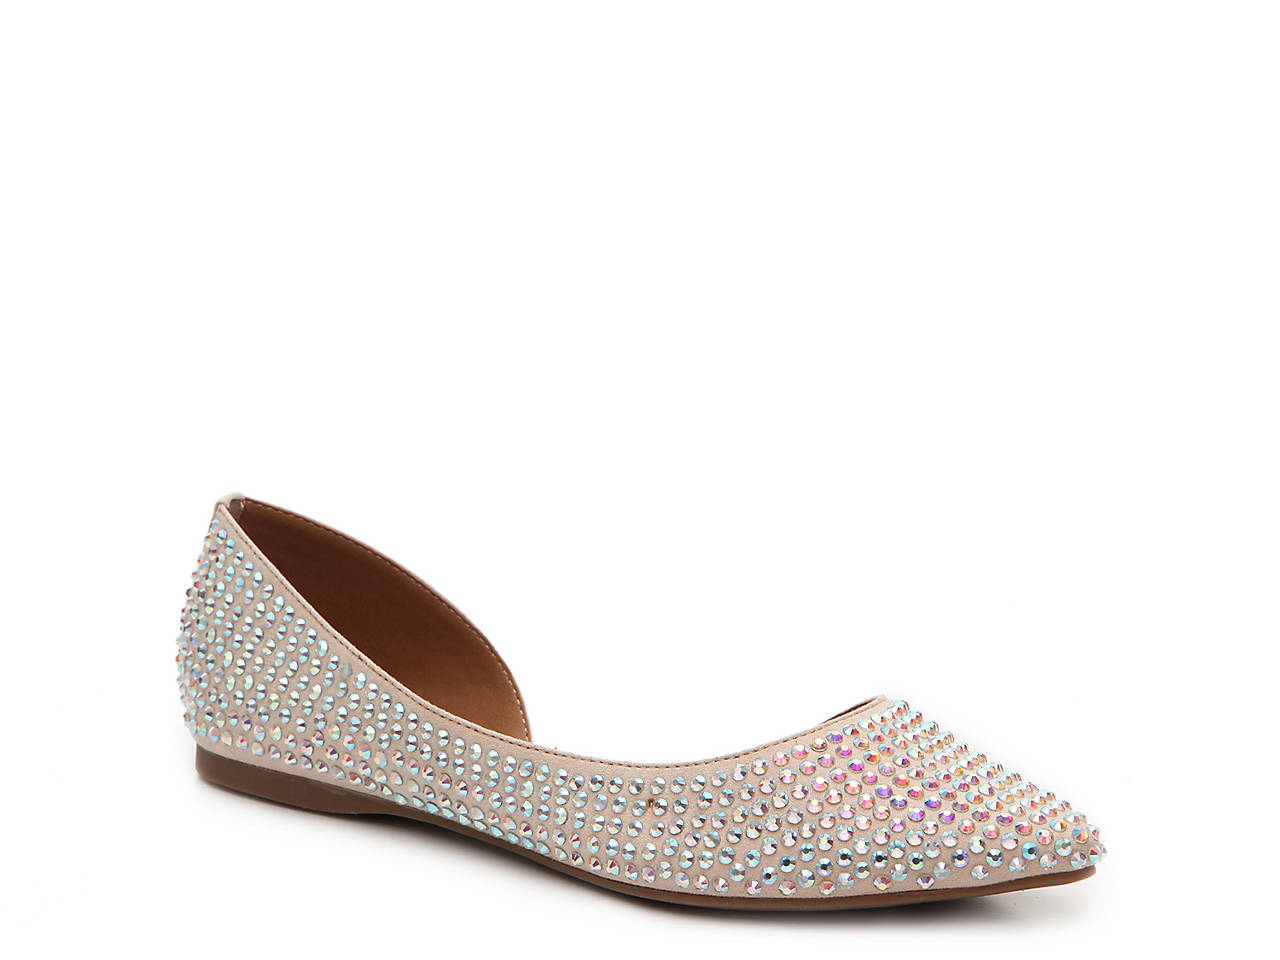 19e46c7a502 Steve Madden Evelina Flat Women s Shoes